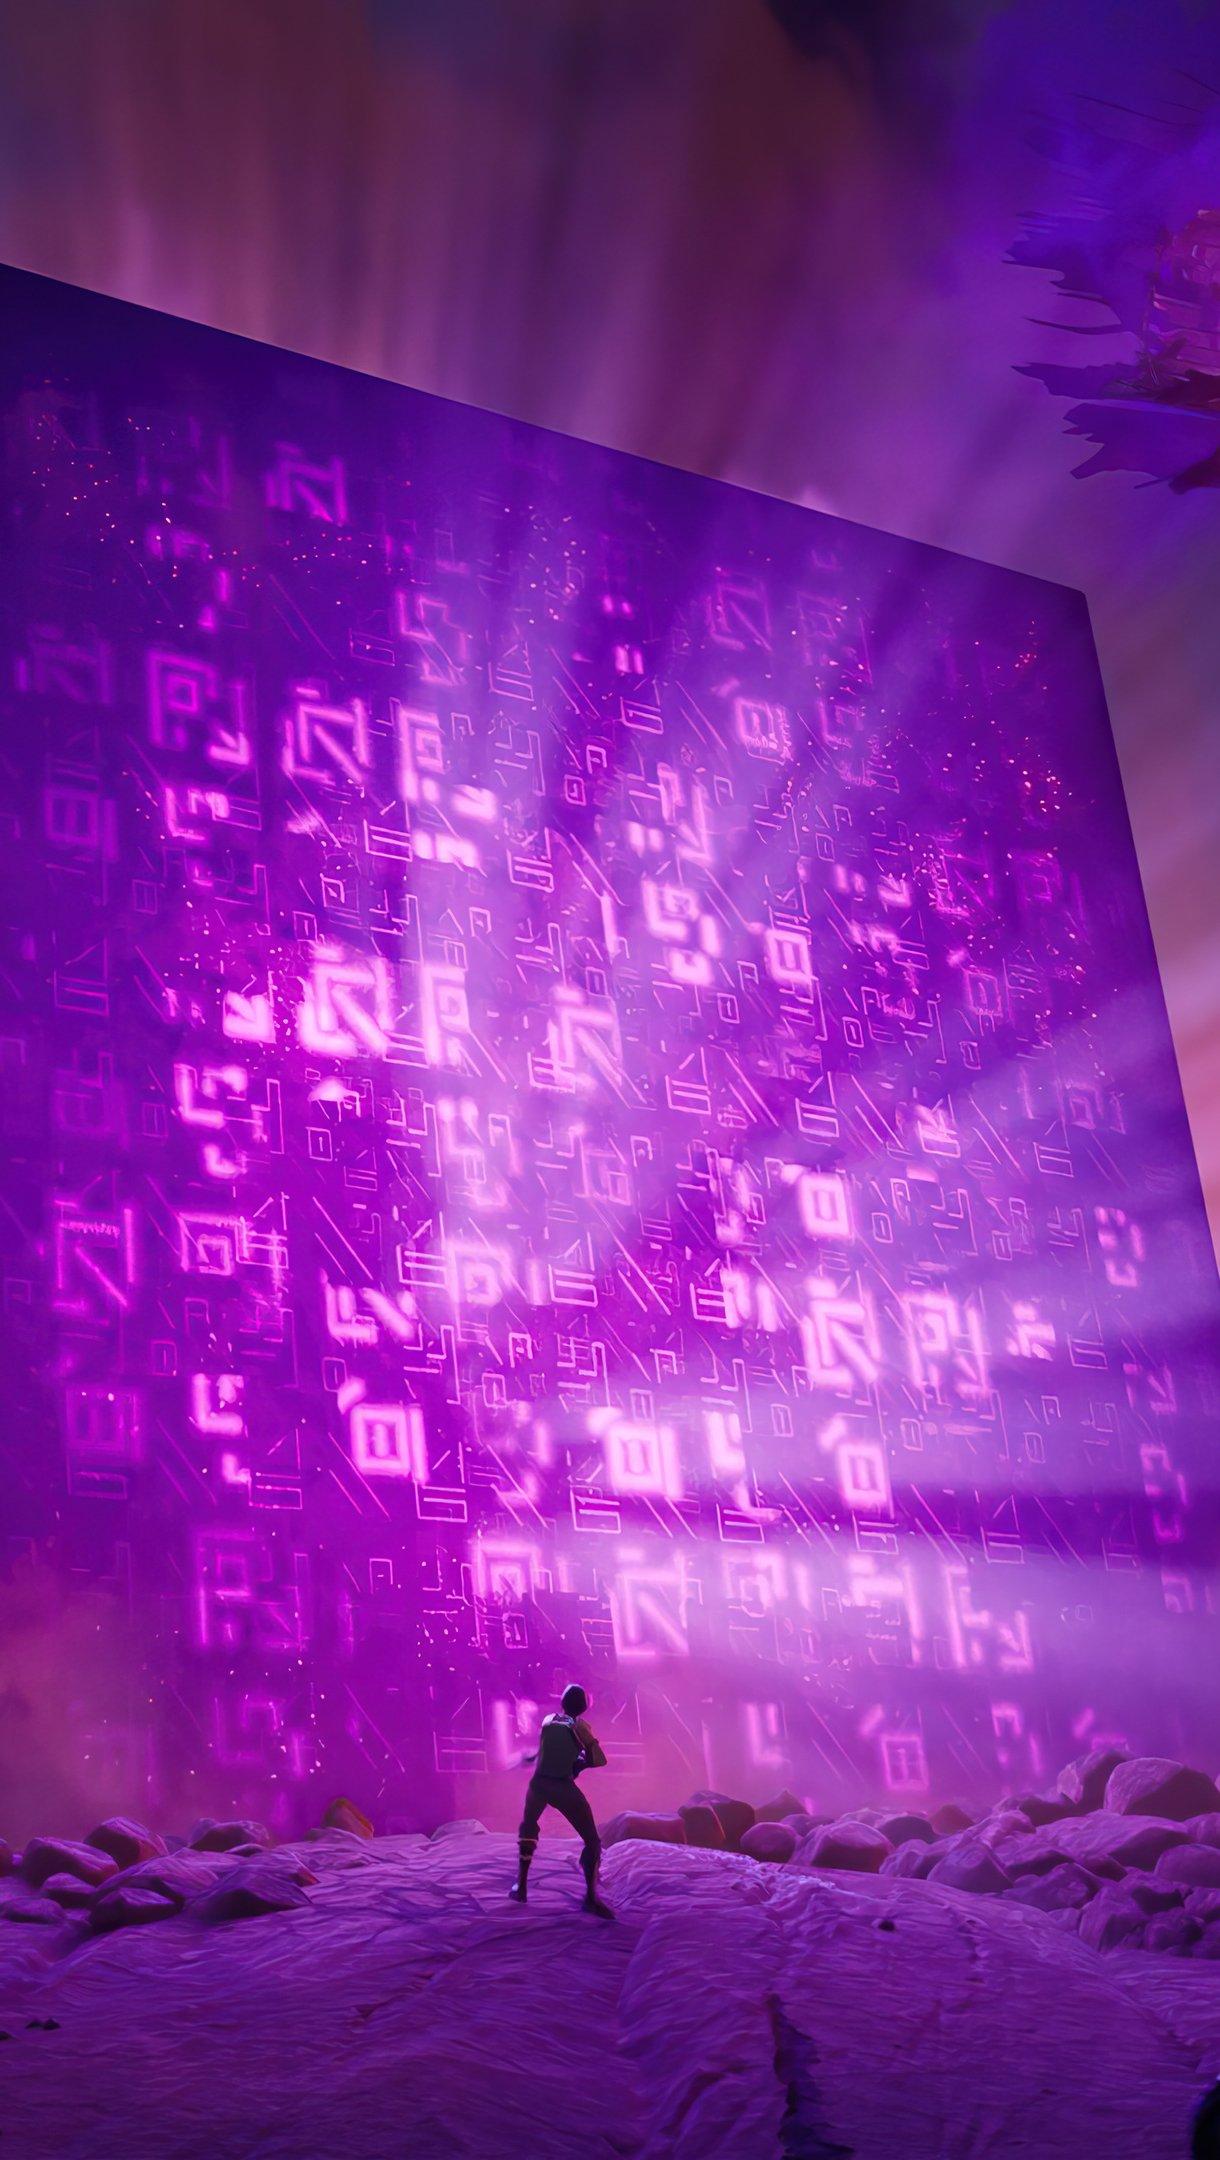 Fondos de pantalla Fortnite Capitulo 2 Temporada Vertical